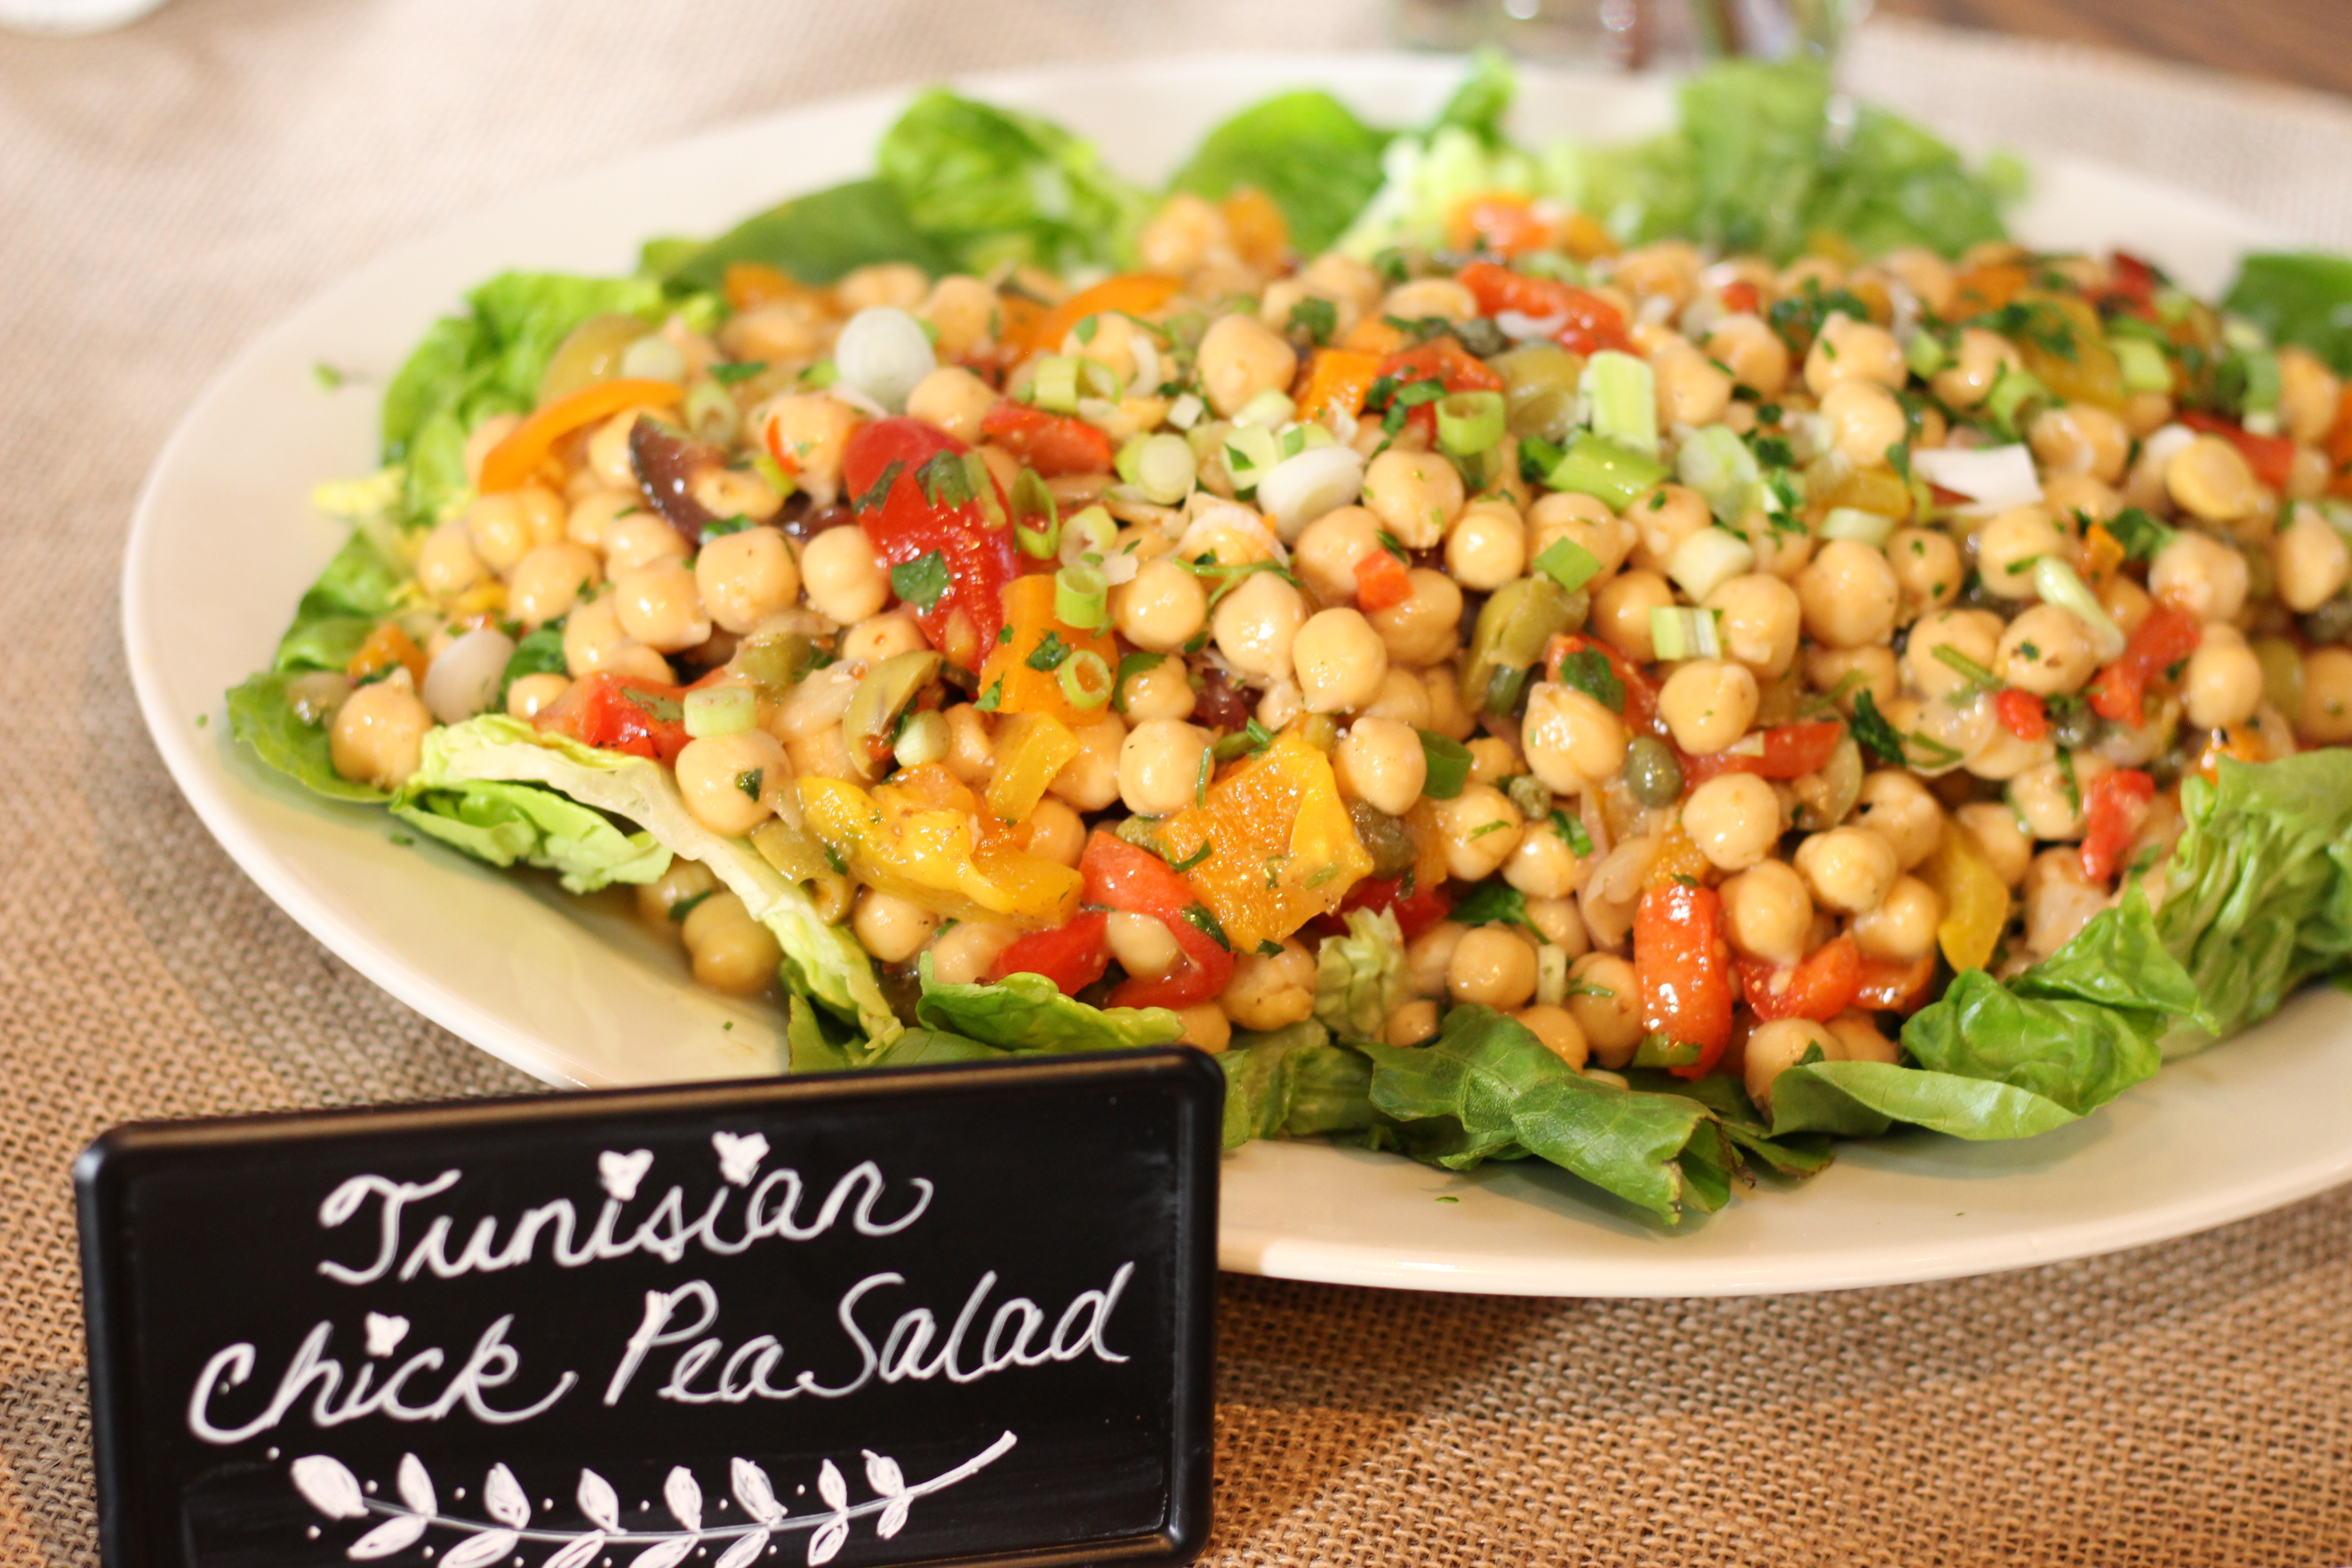 vegan wedding catering chick pea salad